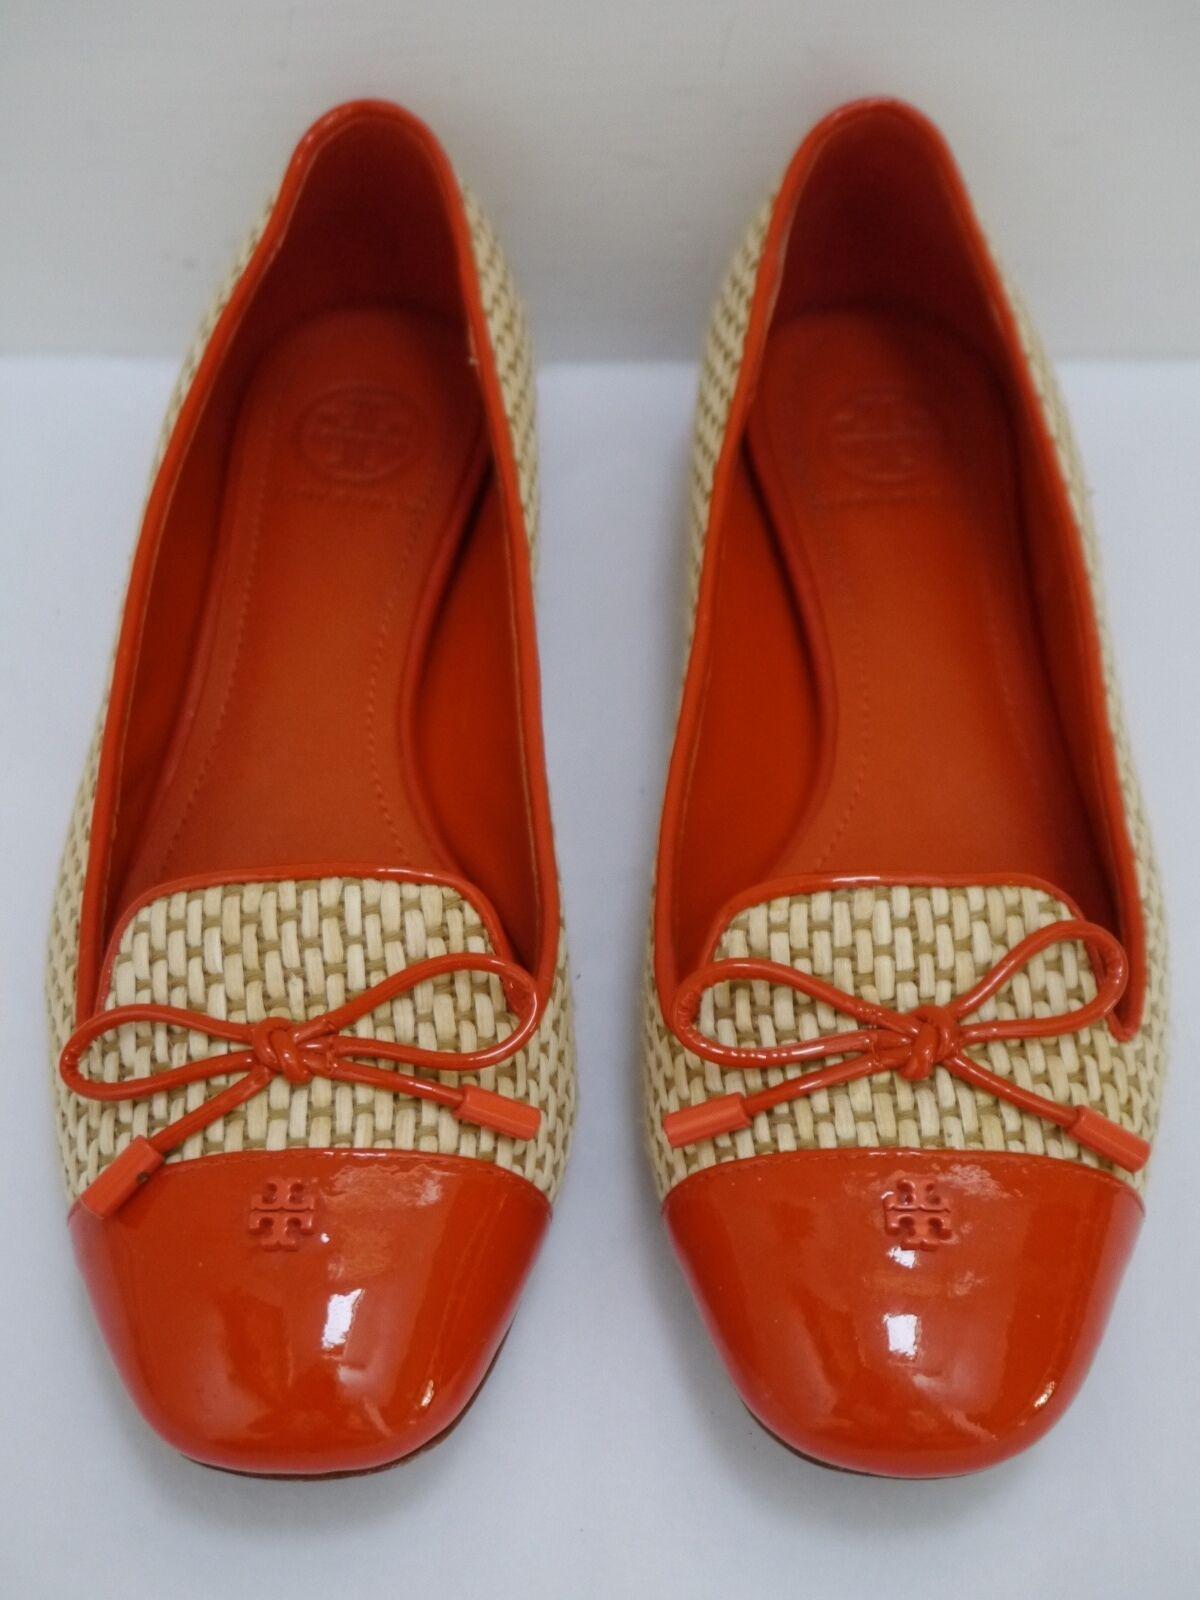 TORY BURCH Catherine orange patent with raffia smoking slippers flats Scarpe 6.5